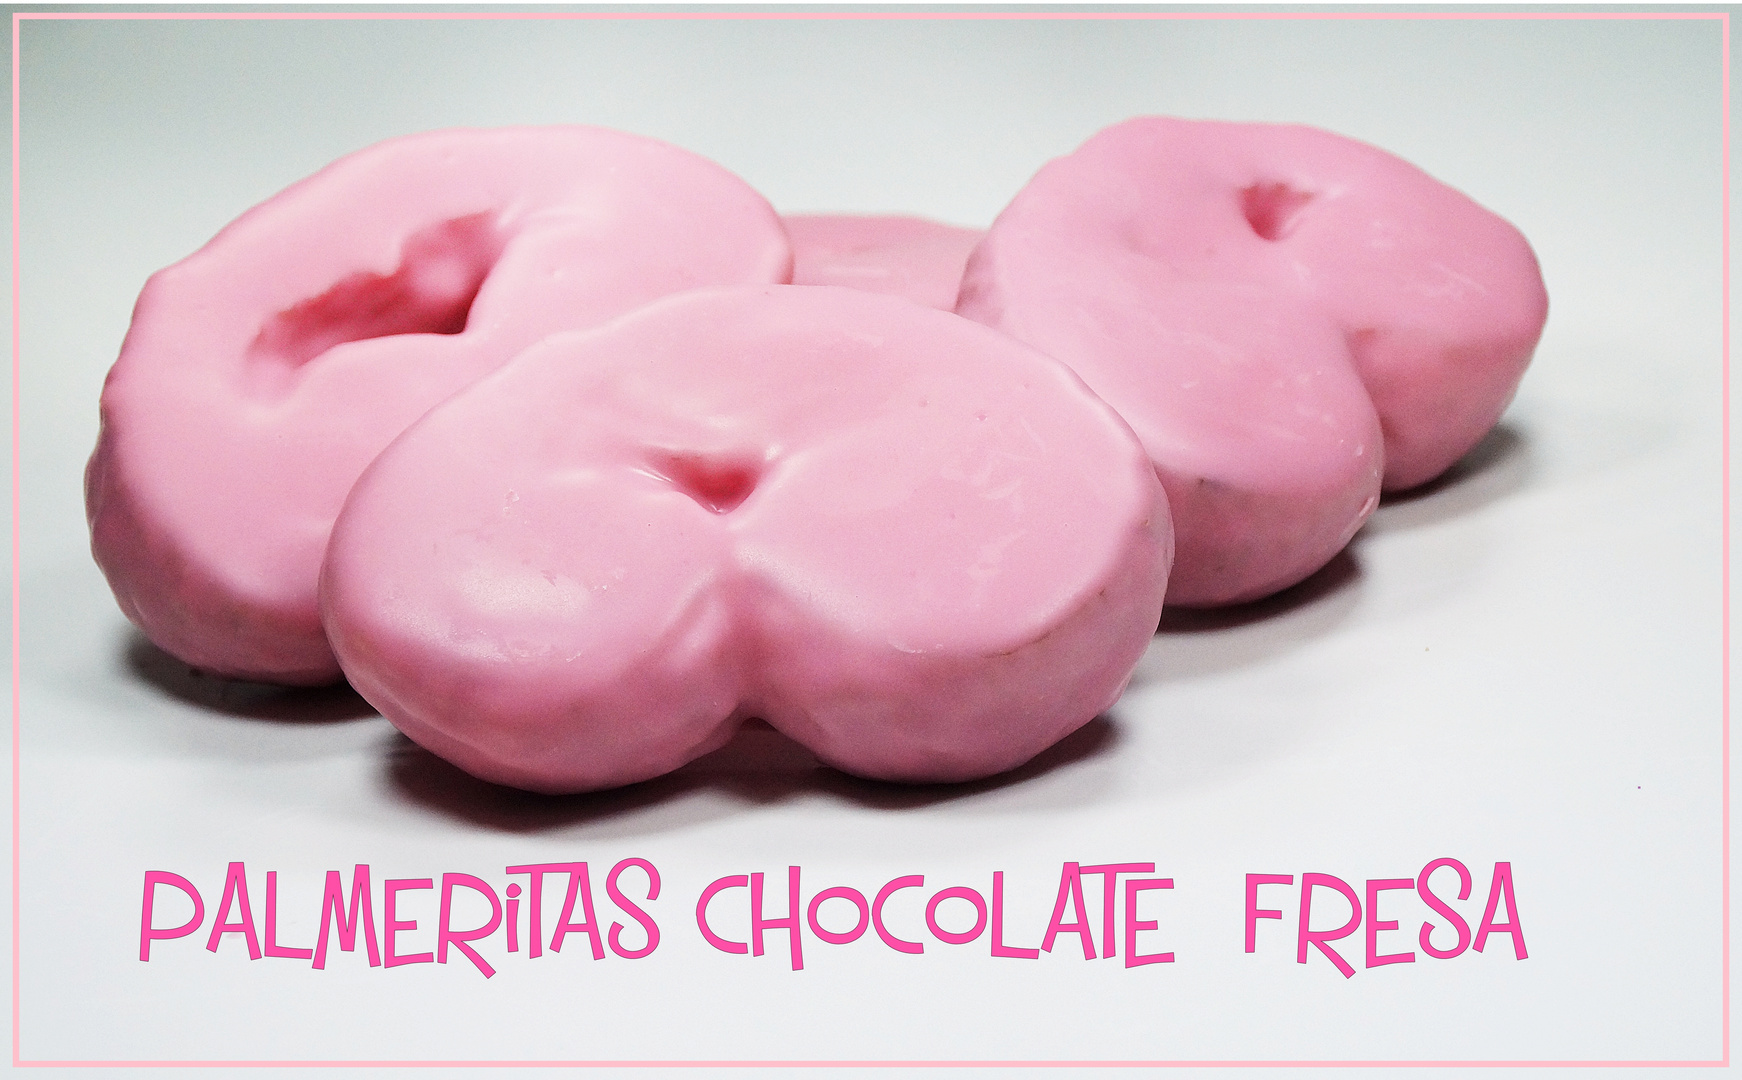 Strawberry Schokolade/ palmeritas chocolate